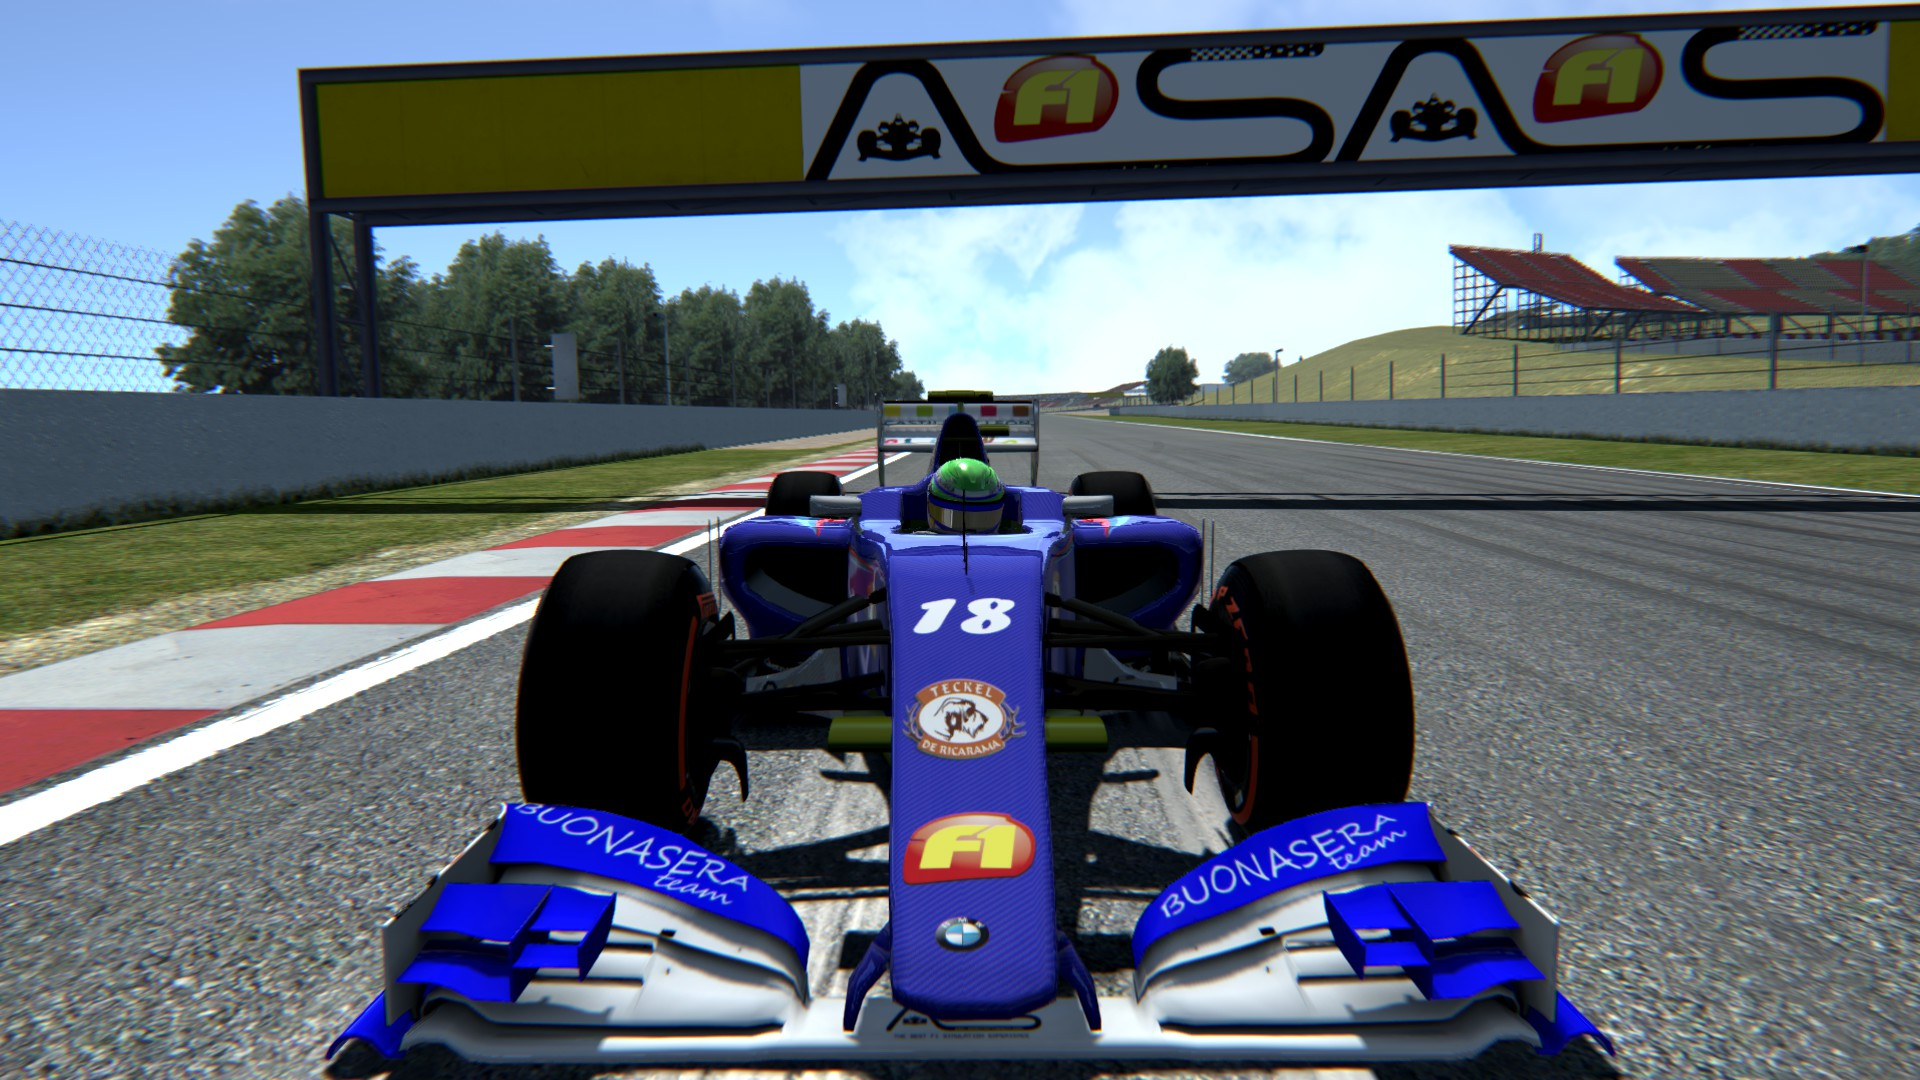 Gp de España F1 Paralela Assetto F1 Spain  61E054983850A11777BD11D76F1FB3D64651A958